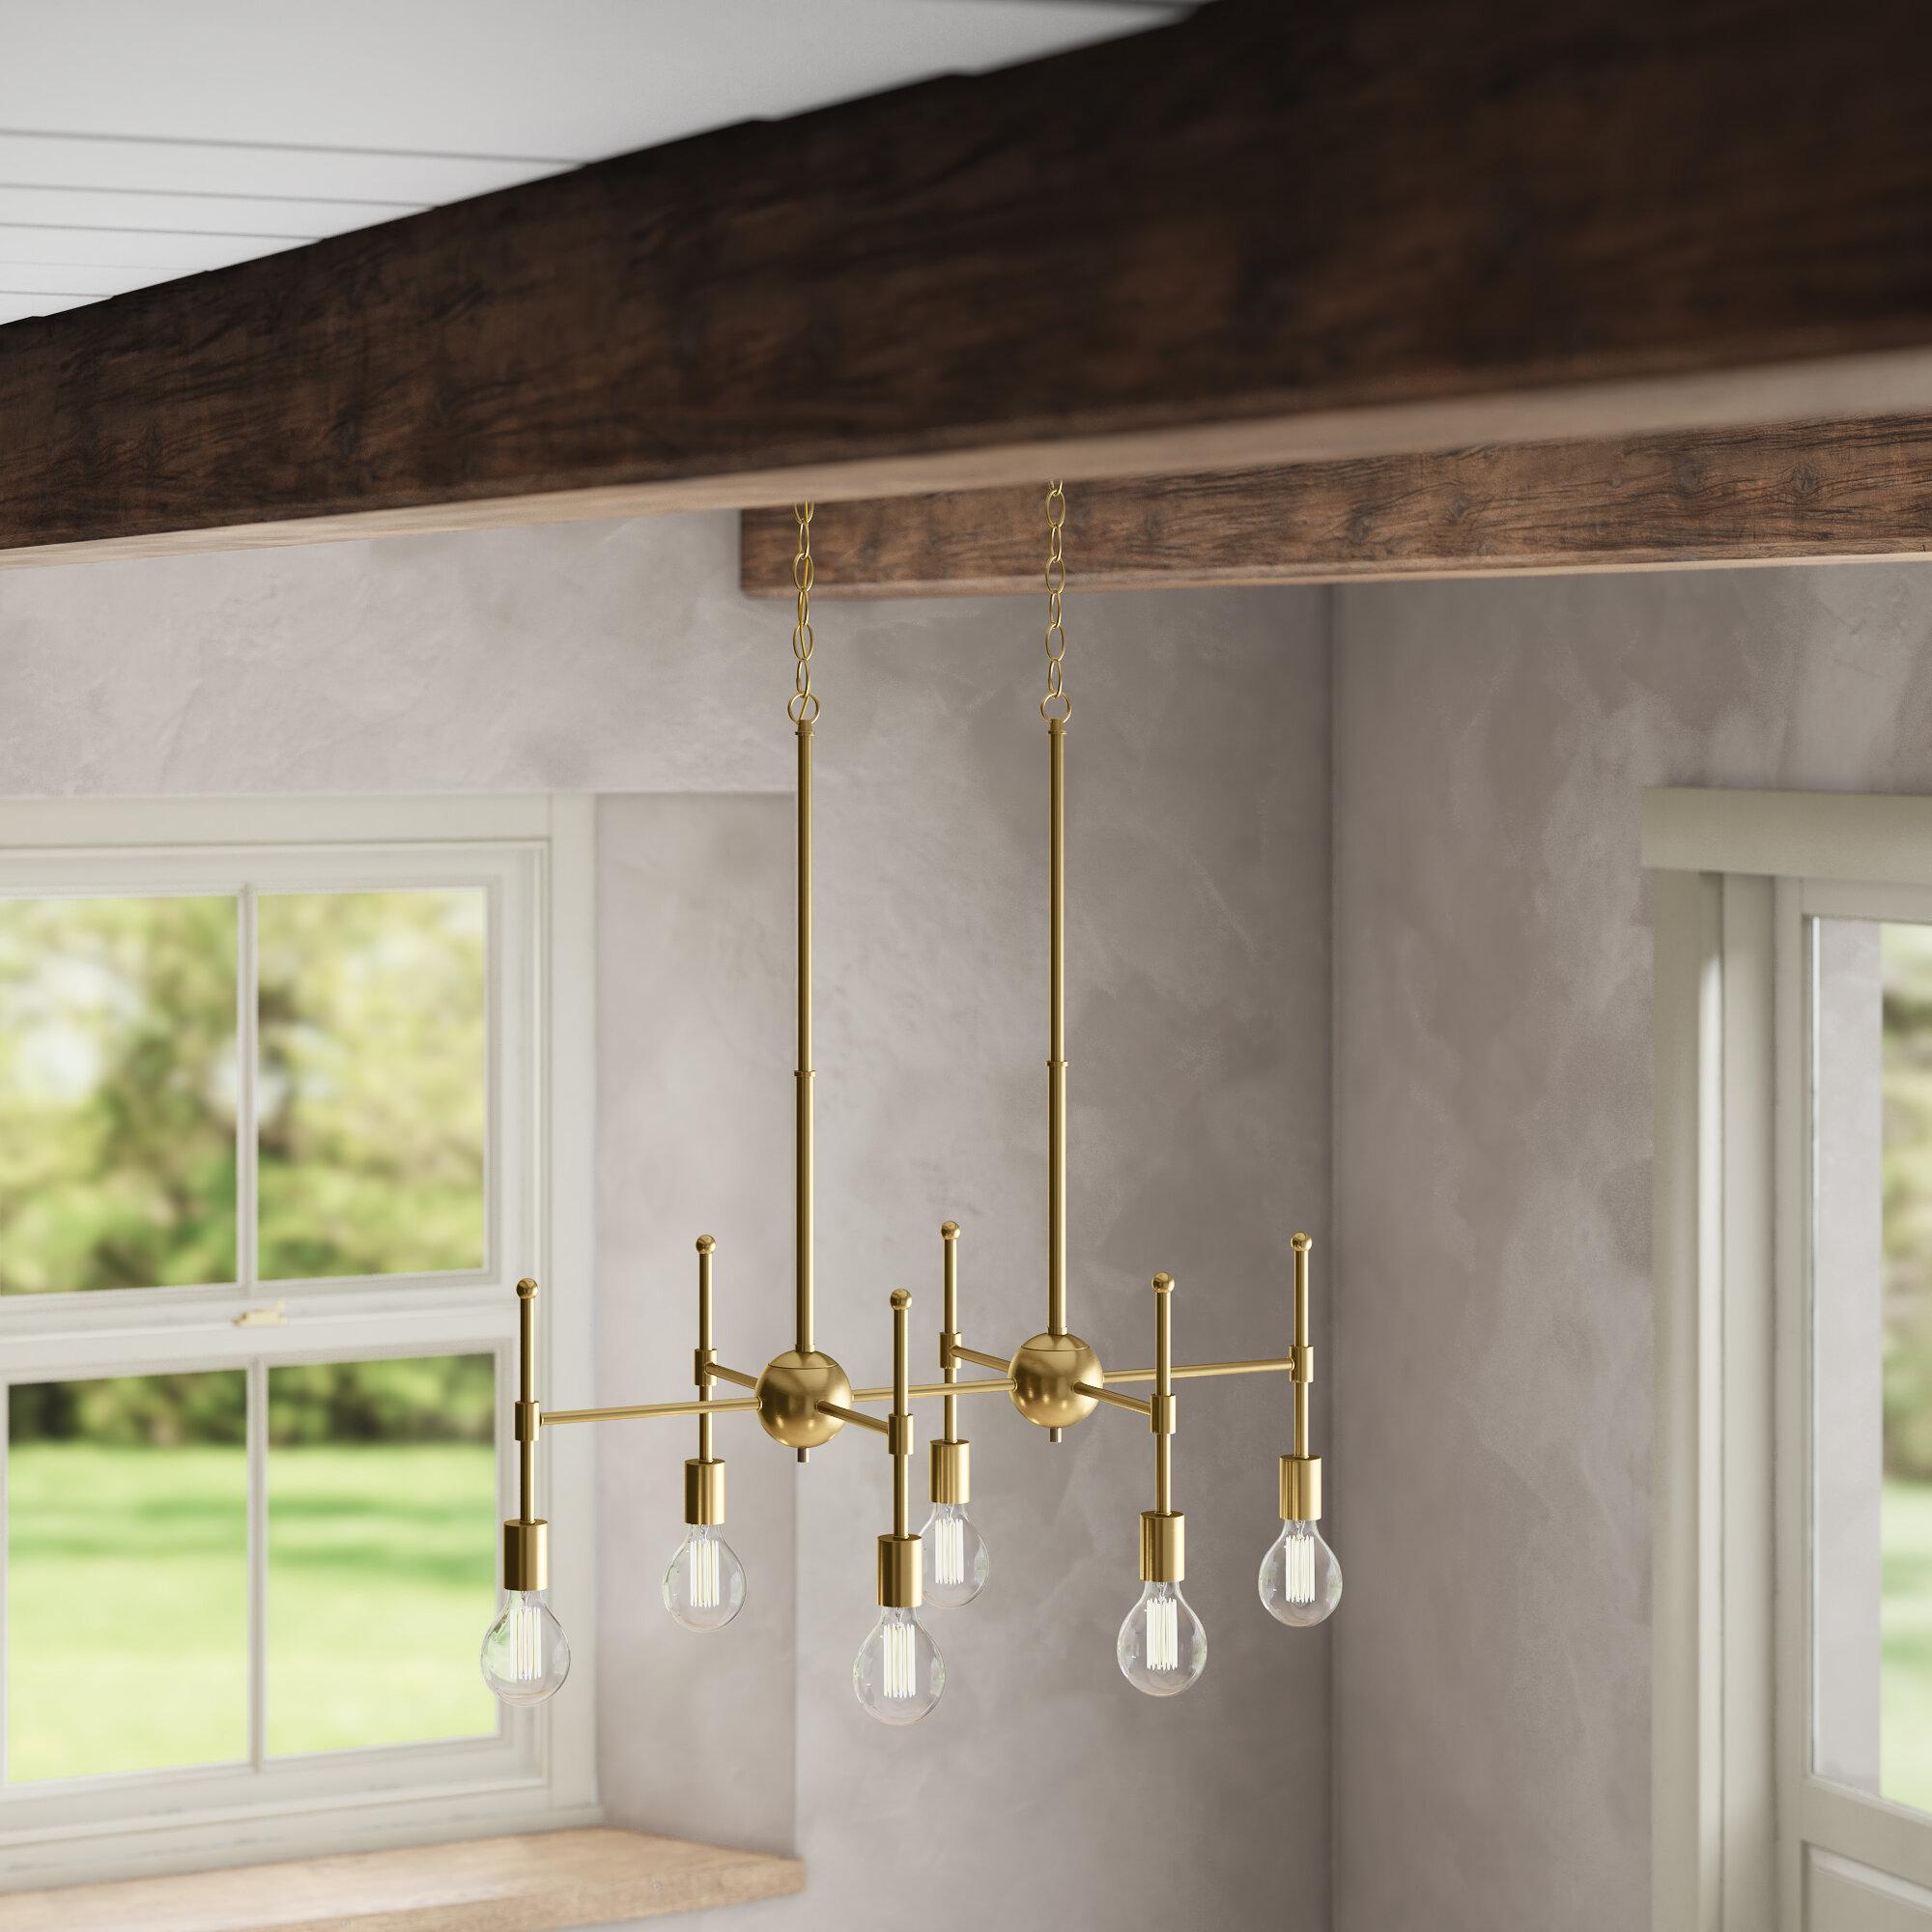 7 10 Light Kitchen Island Pendant Lighting You Ll Love In 2021 Wayfair